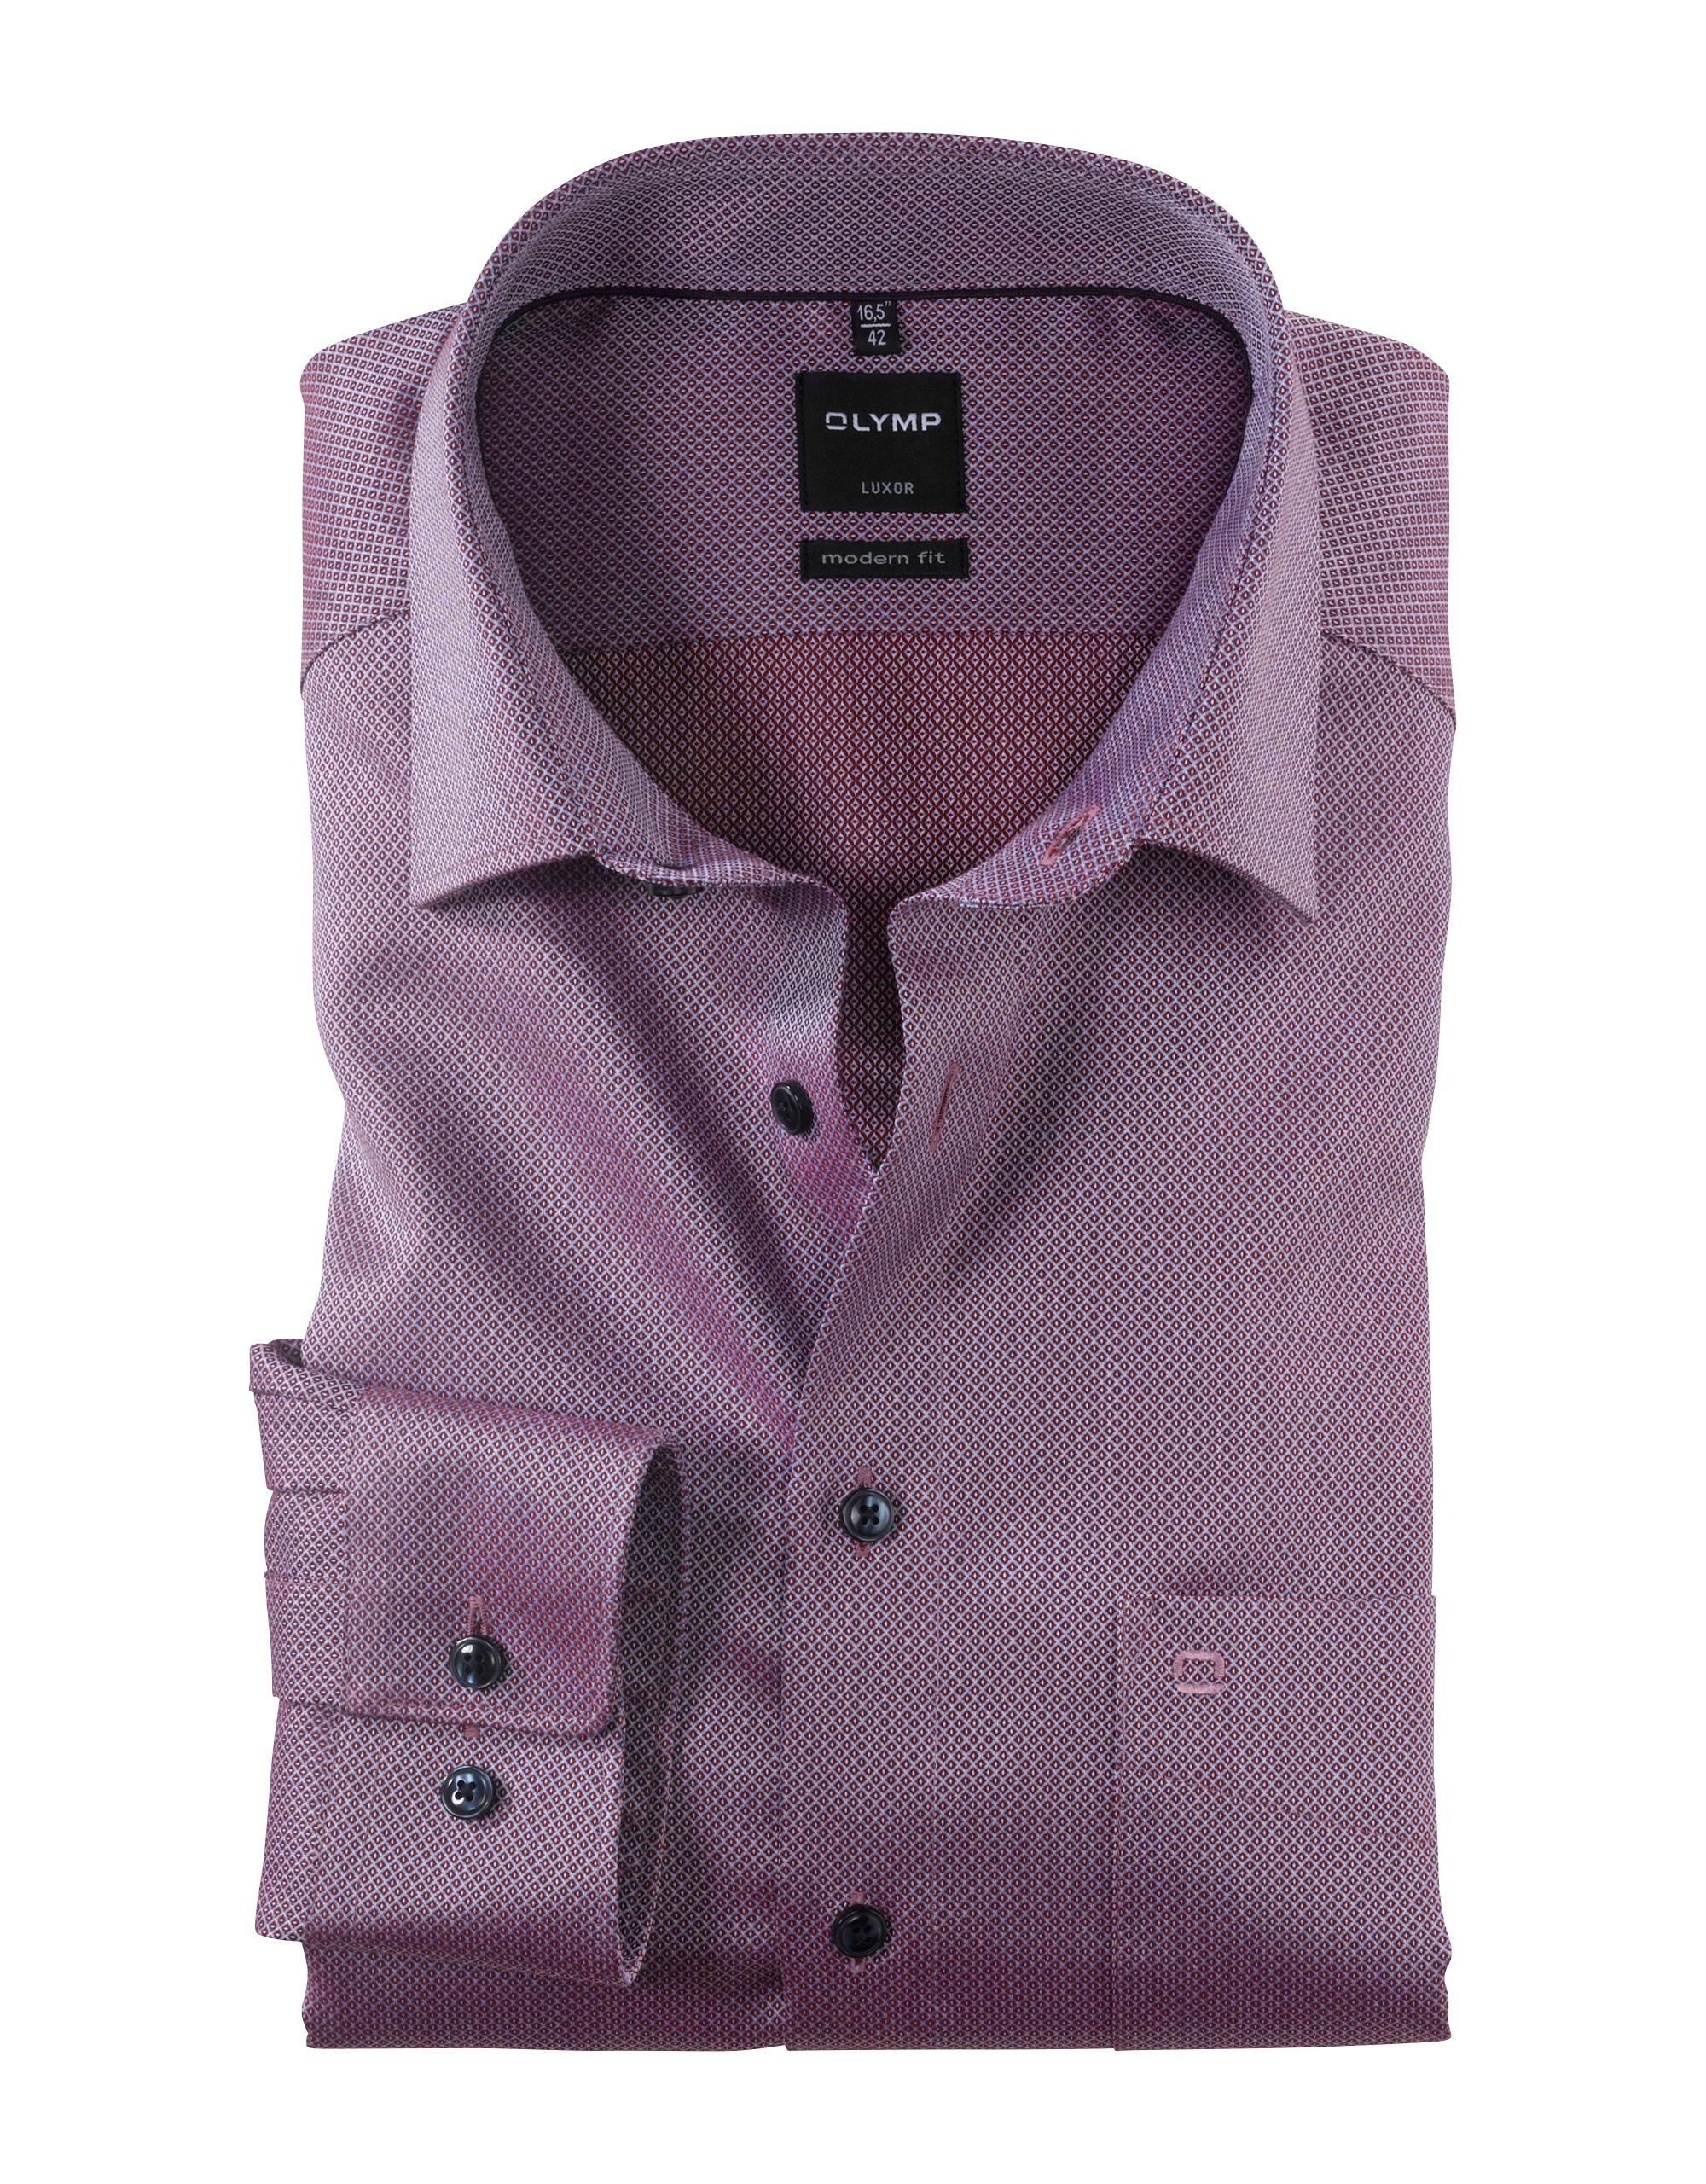 OLYMP Luxor Hemd, modern fit, New Kent, Dunkelrot, 42   Bekleidung > Hemden > Sonstige Hemden   Dunkelrot   Baumwolle   OLYMP